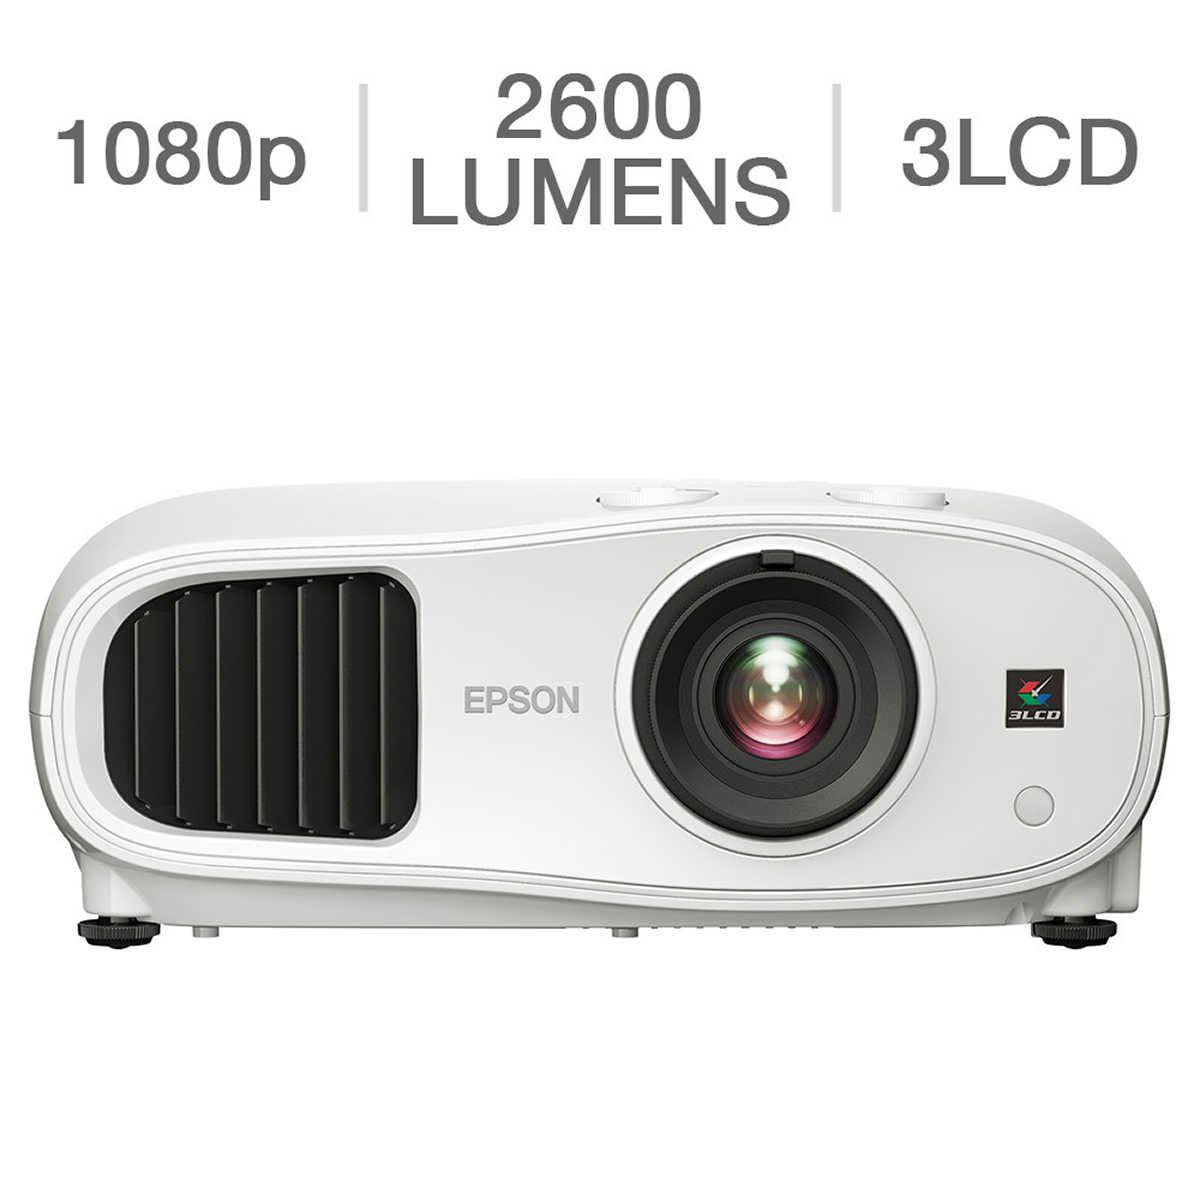 f71713860190fe Epson Home Cinema 3100 Full HD 1080p 3LCD Projector